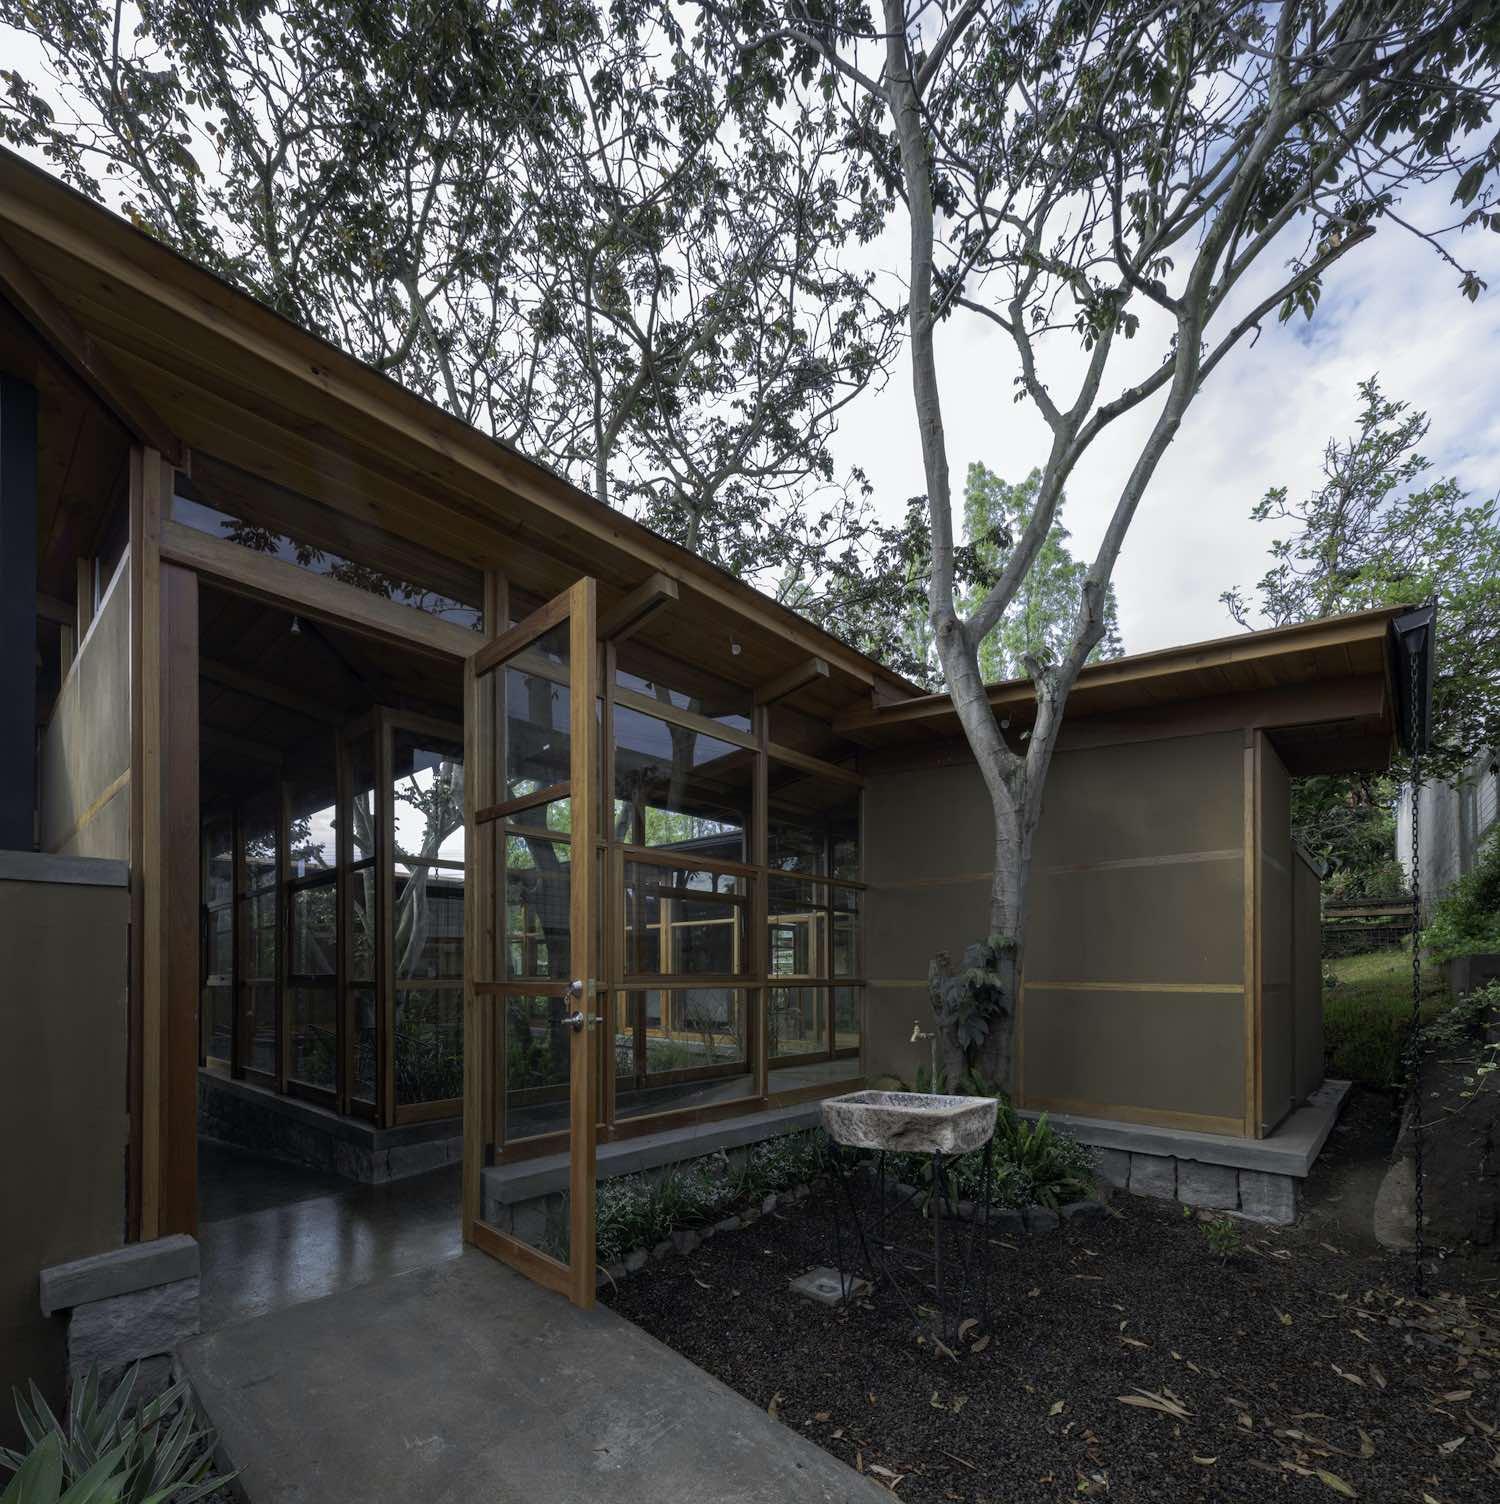 House among trees in Cumbayá, Ecuador designed by El Sindicato Arquitectura